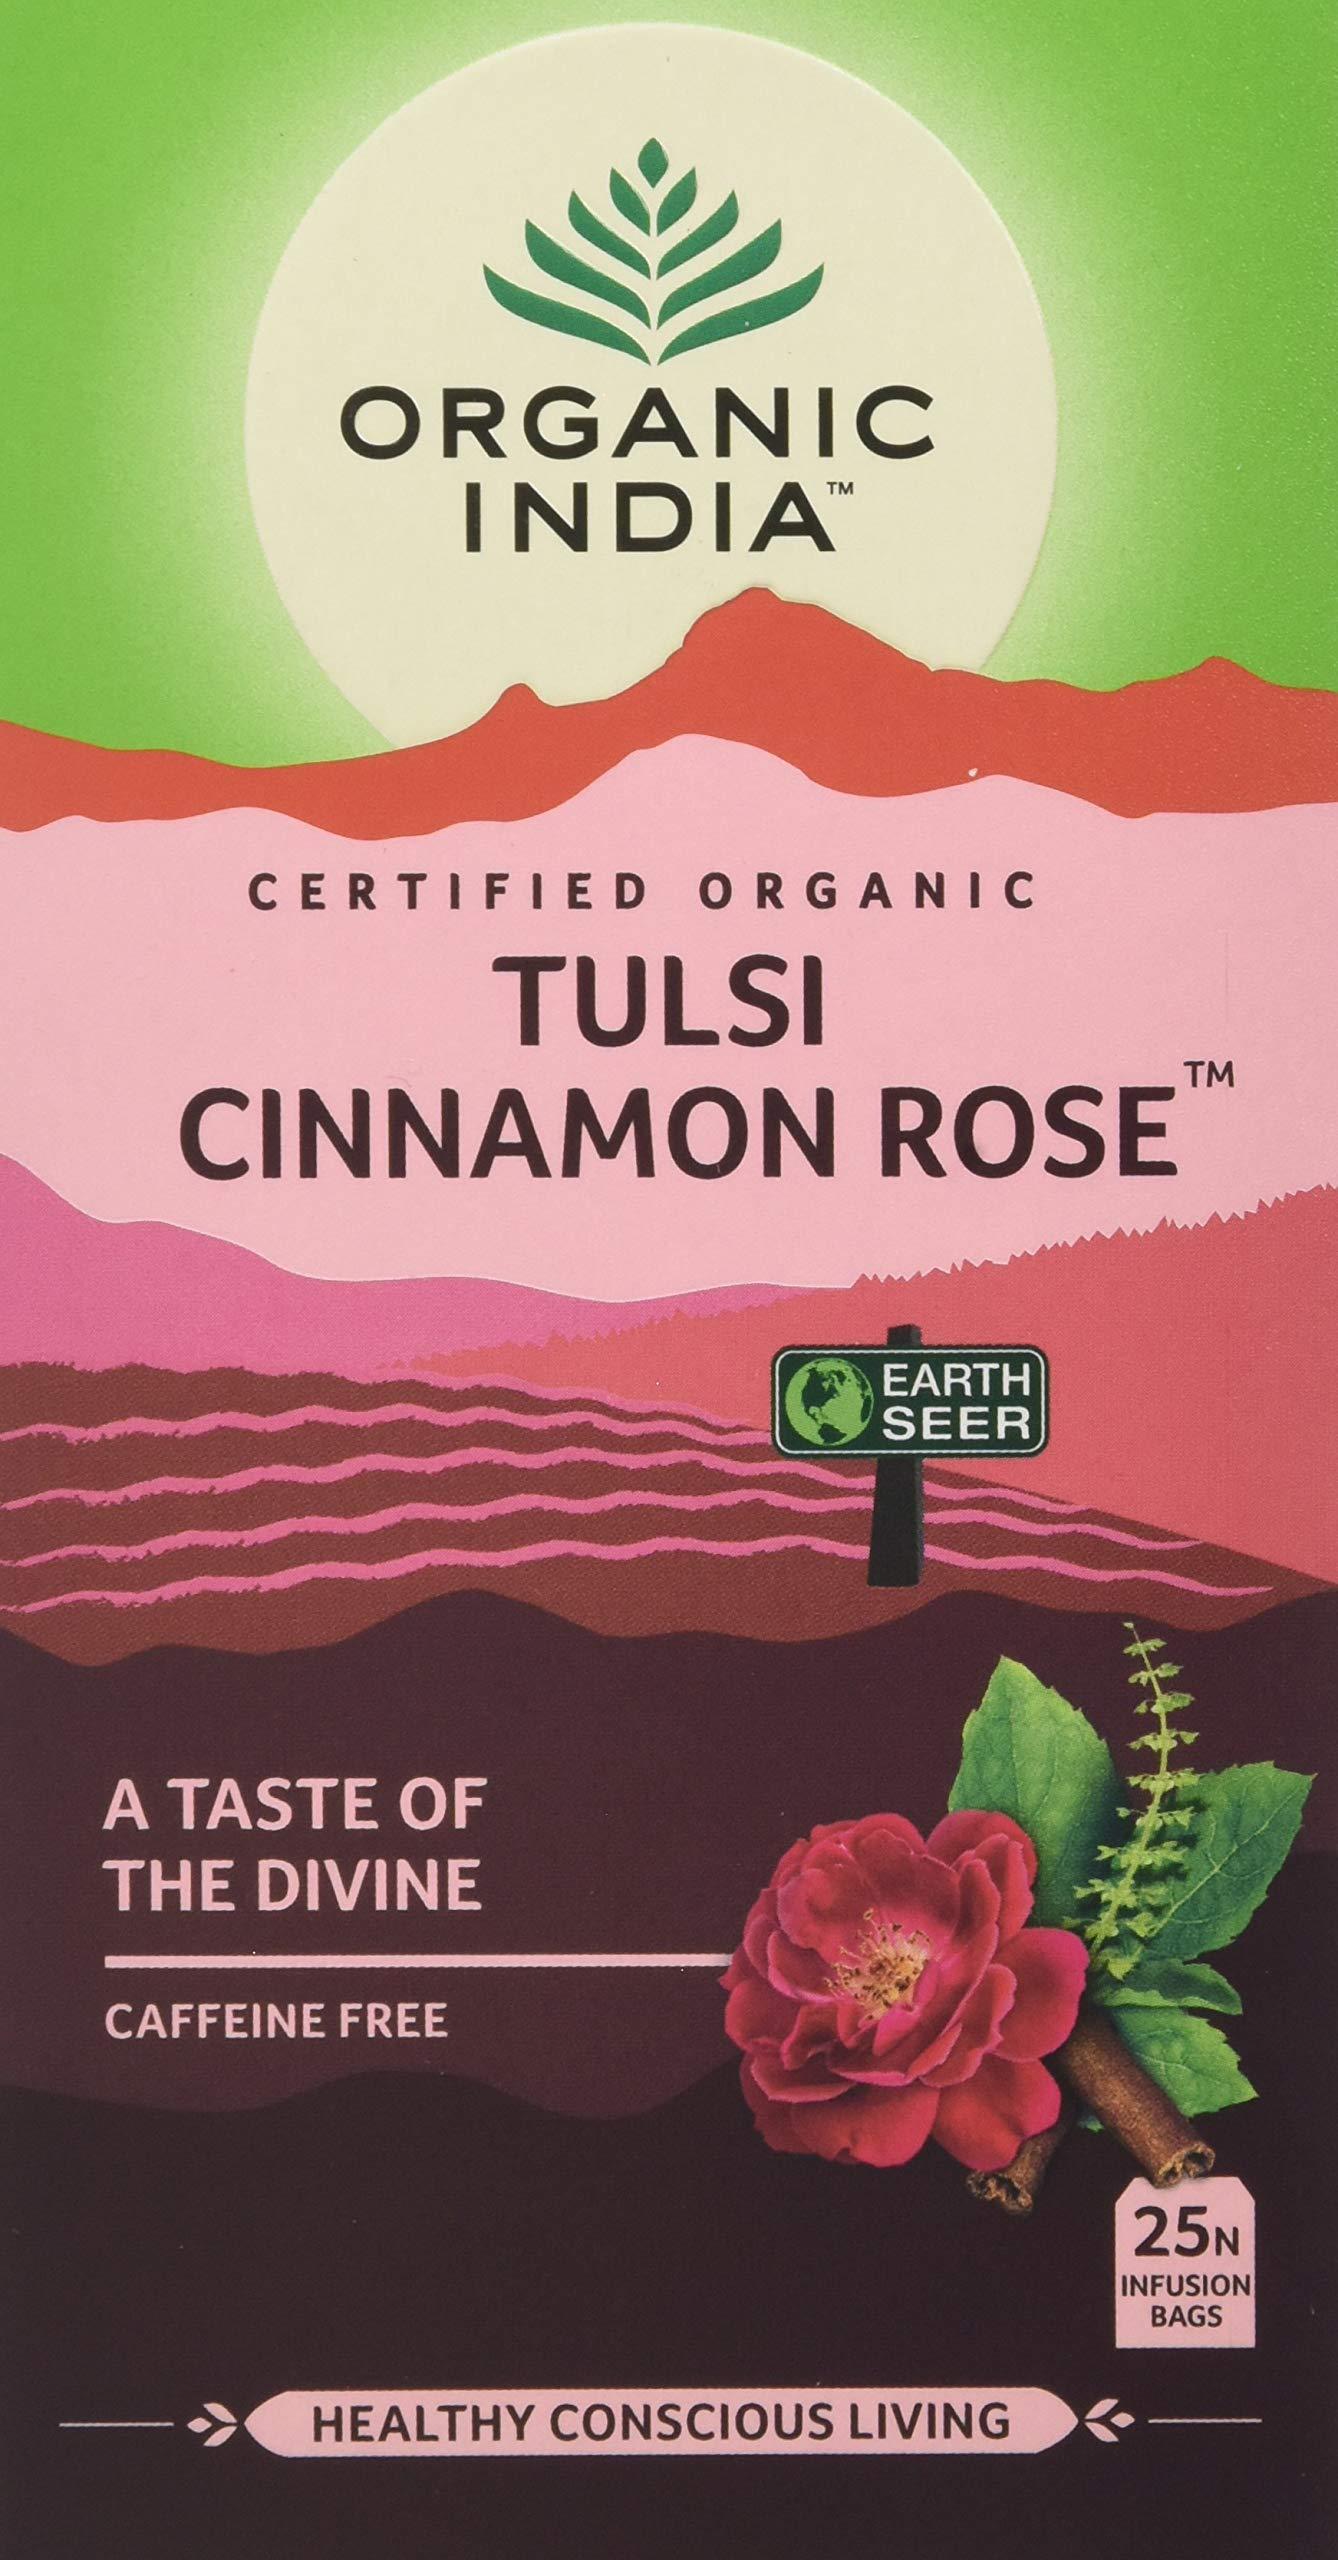 ORGANIC INDIA HEALTHY CONSCIOUS LIVING Tulsi Cinnamon Tea 25 Infusion Bags, Rose, 45 Gram